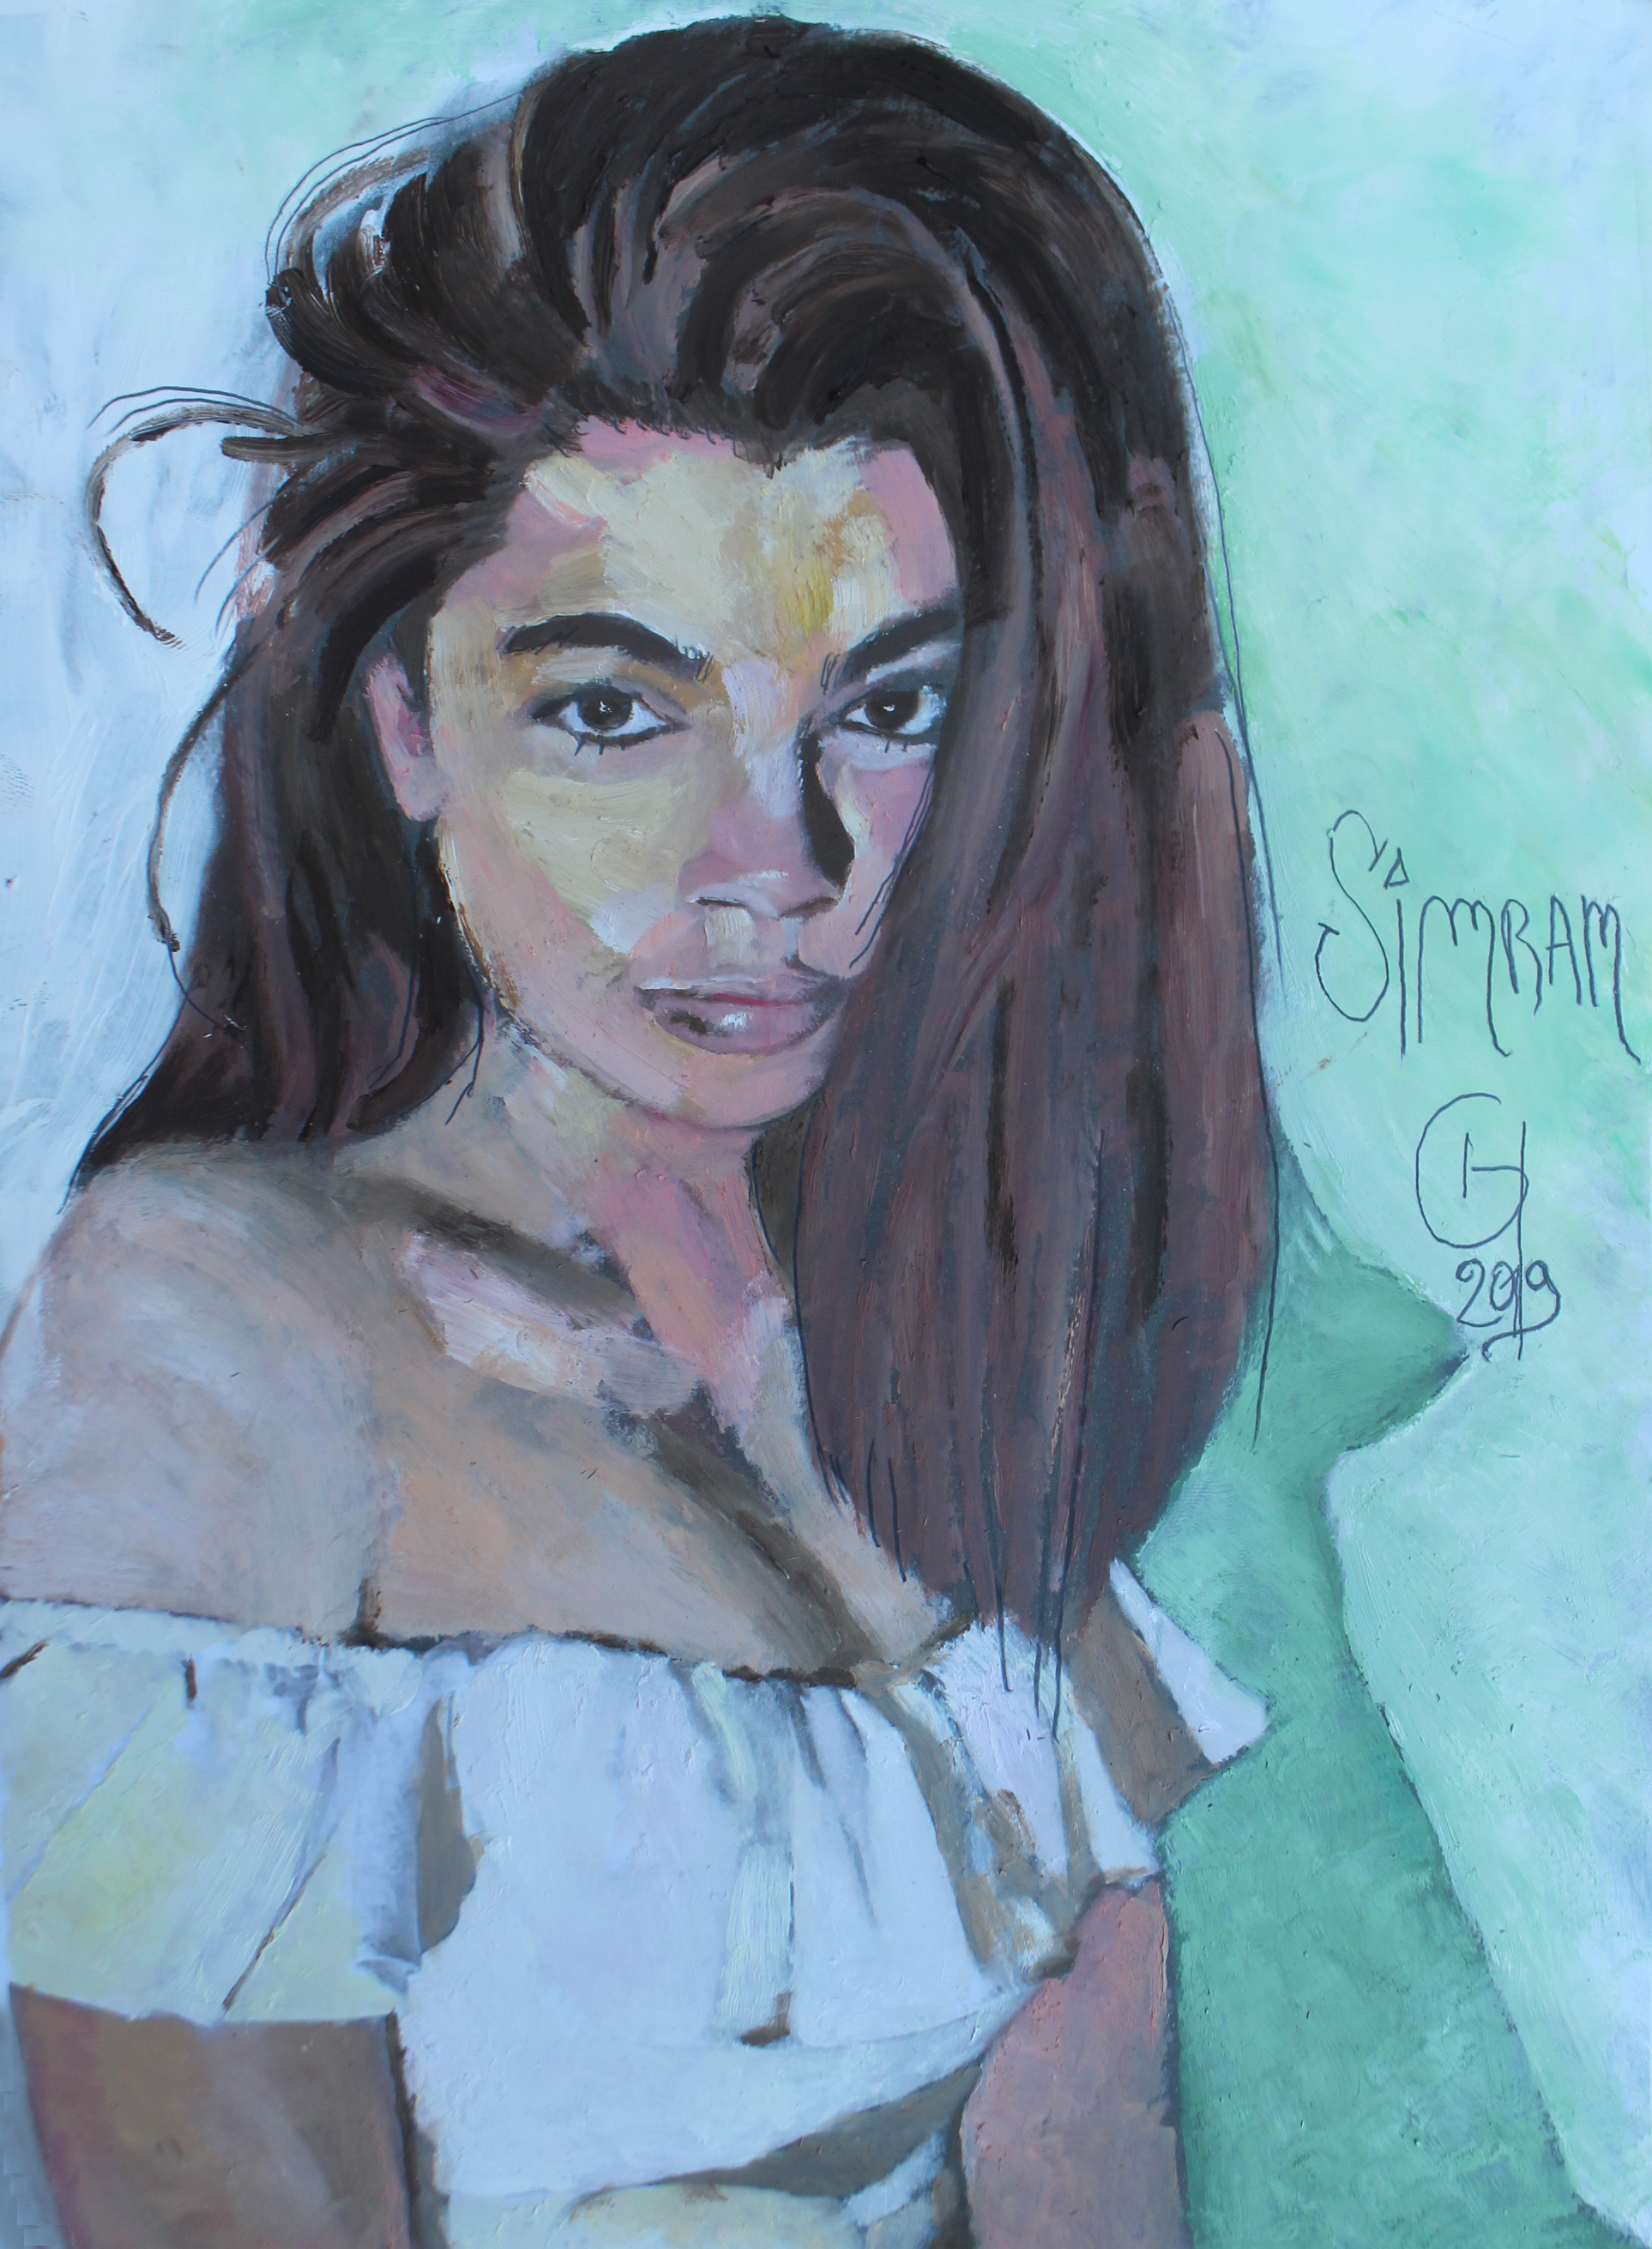 Simran_-_Grégory_Huck